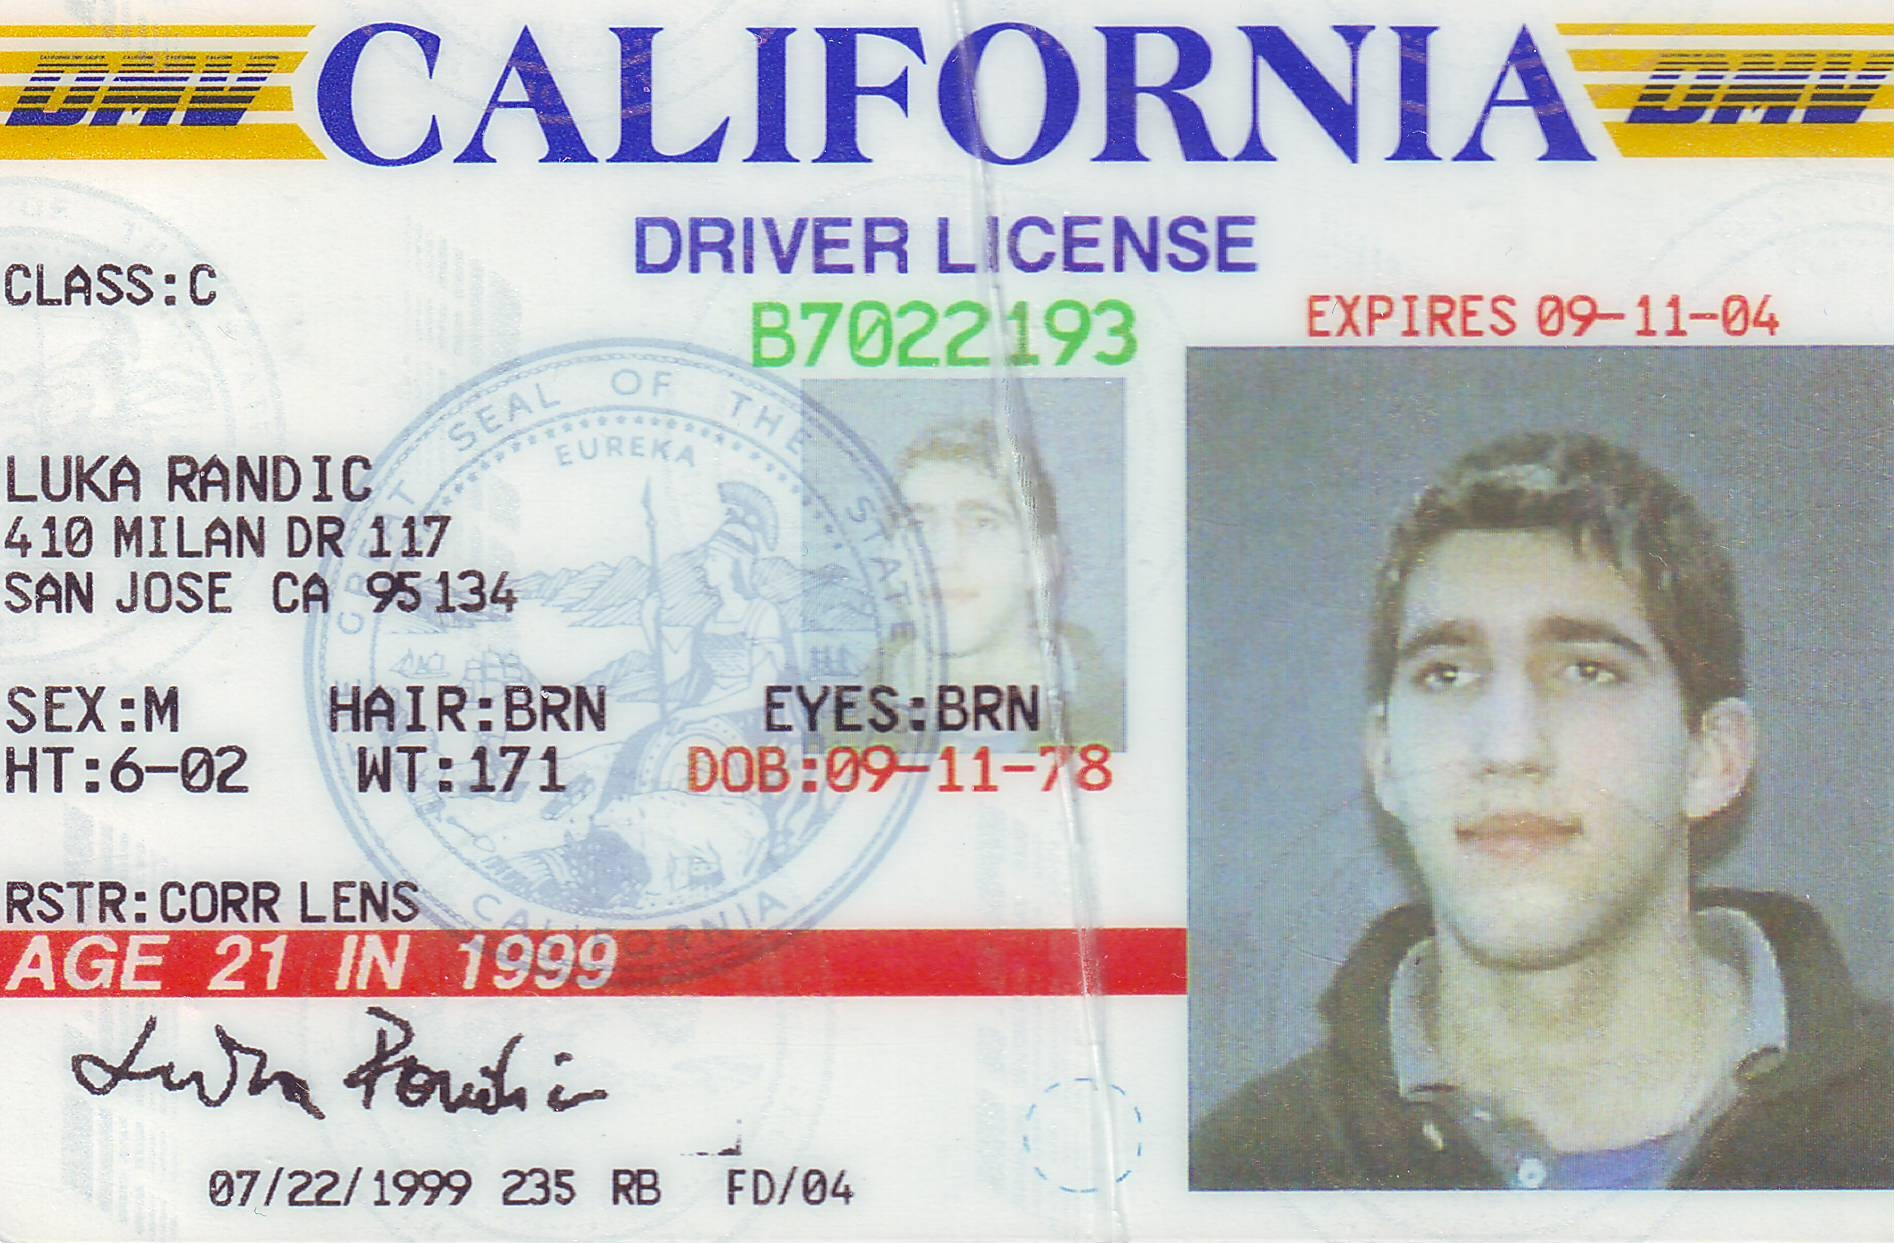 Ca Teen Drivers 51